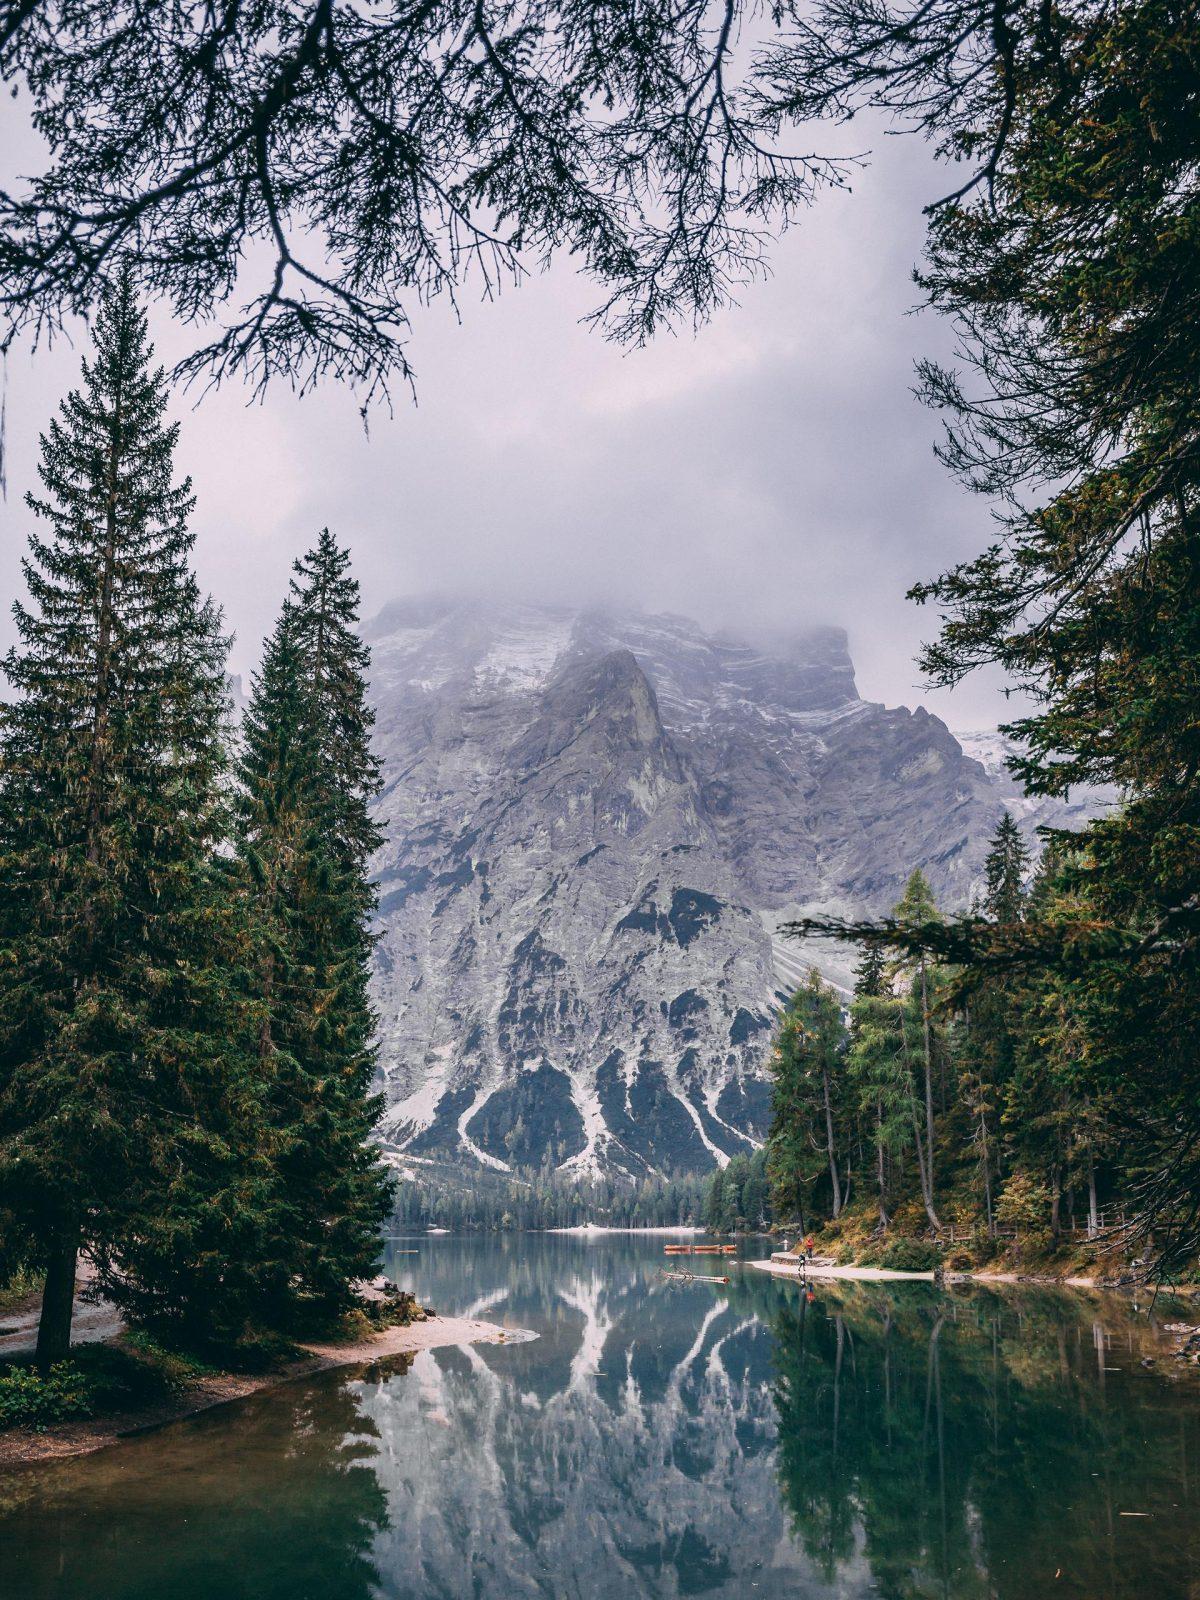 Mountain over lake